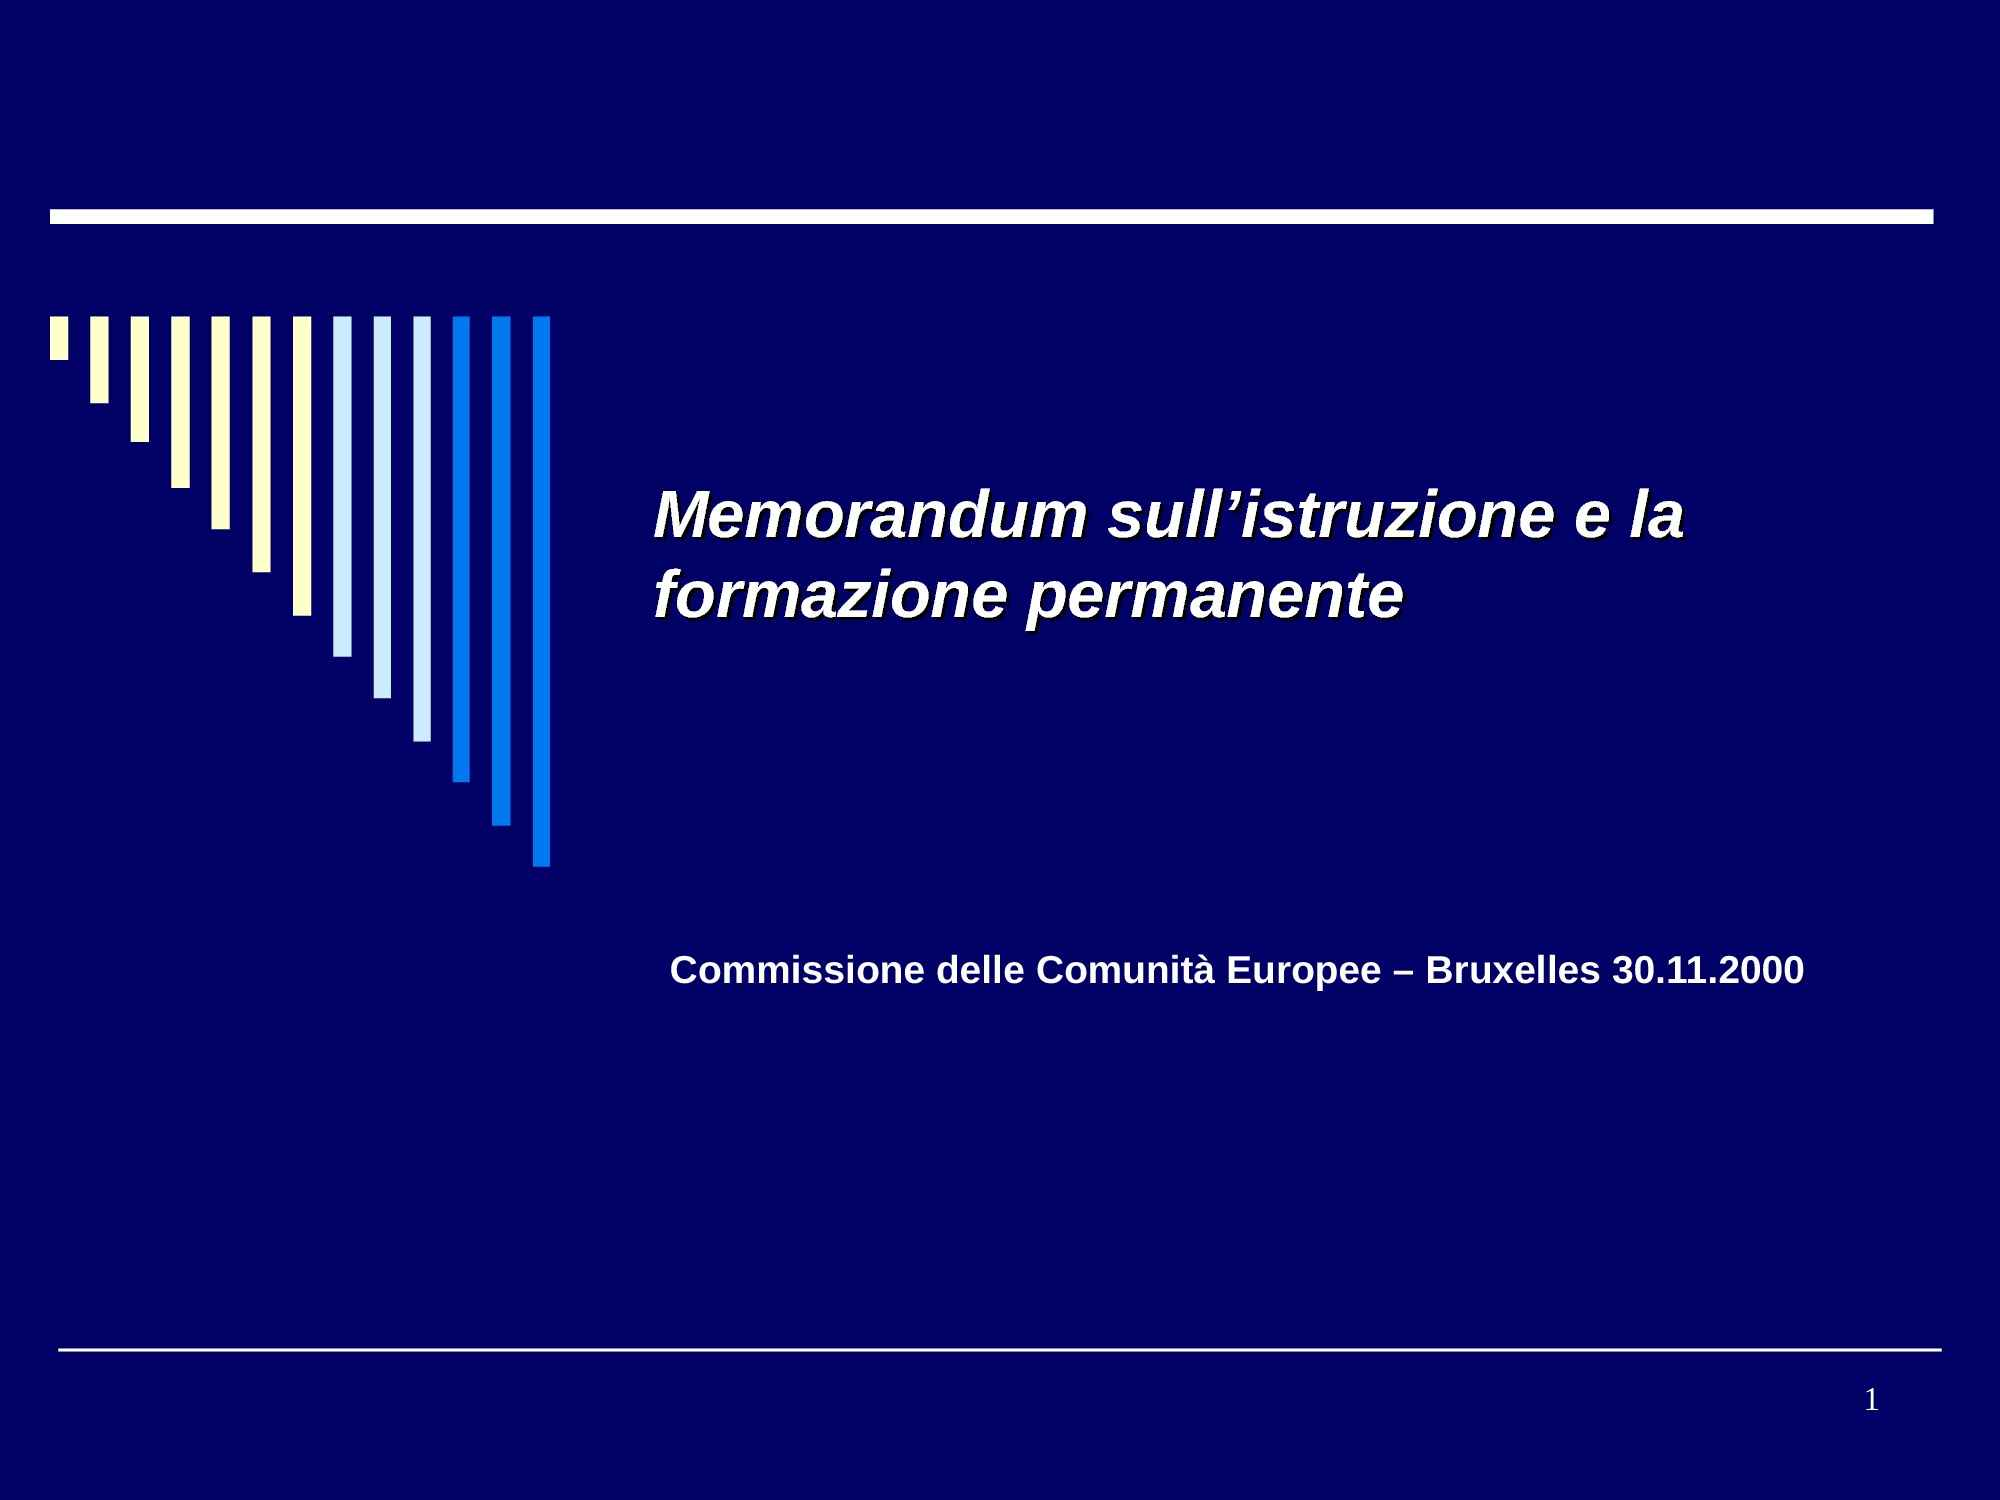 Formazione permanente - Memorandum